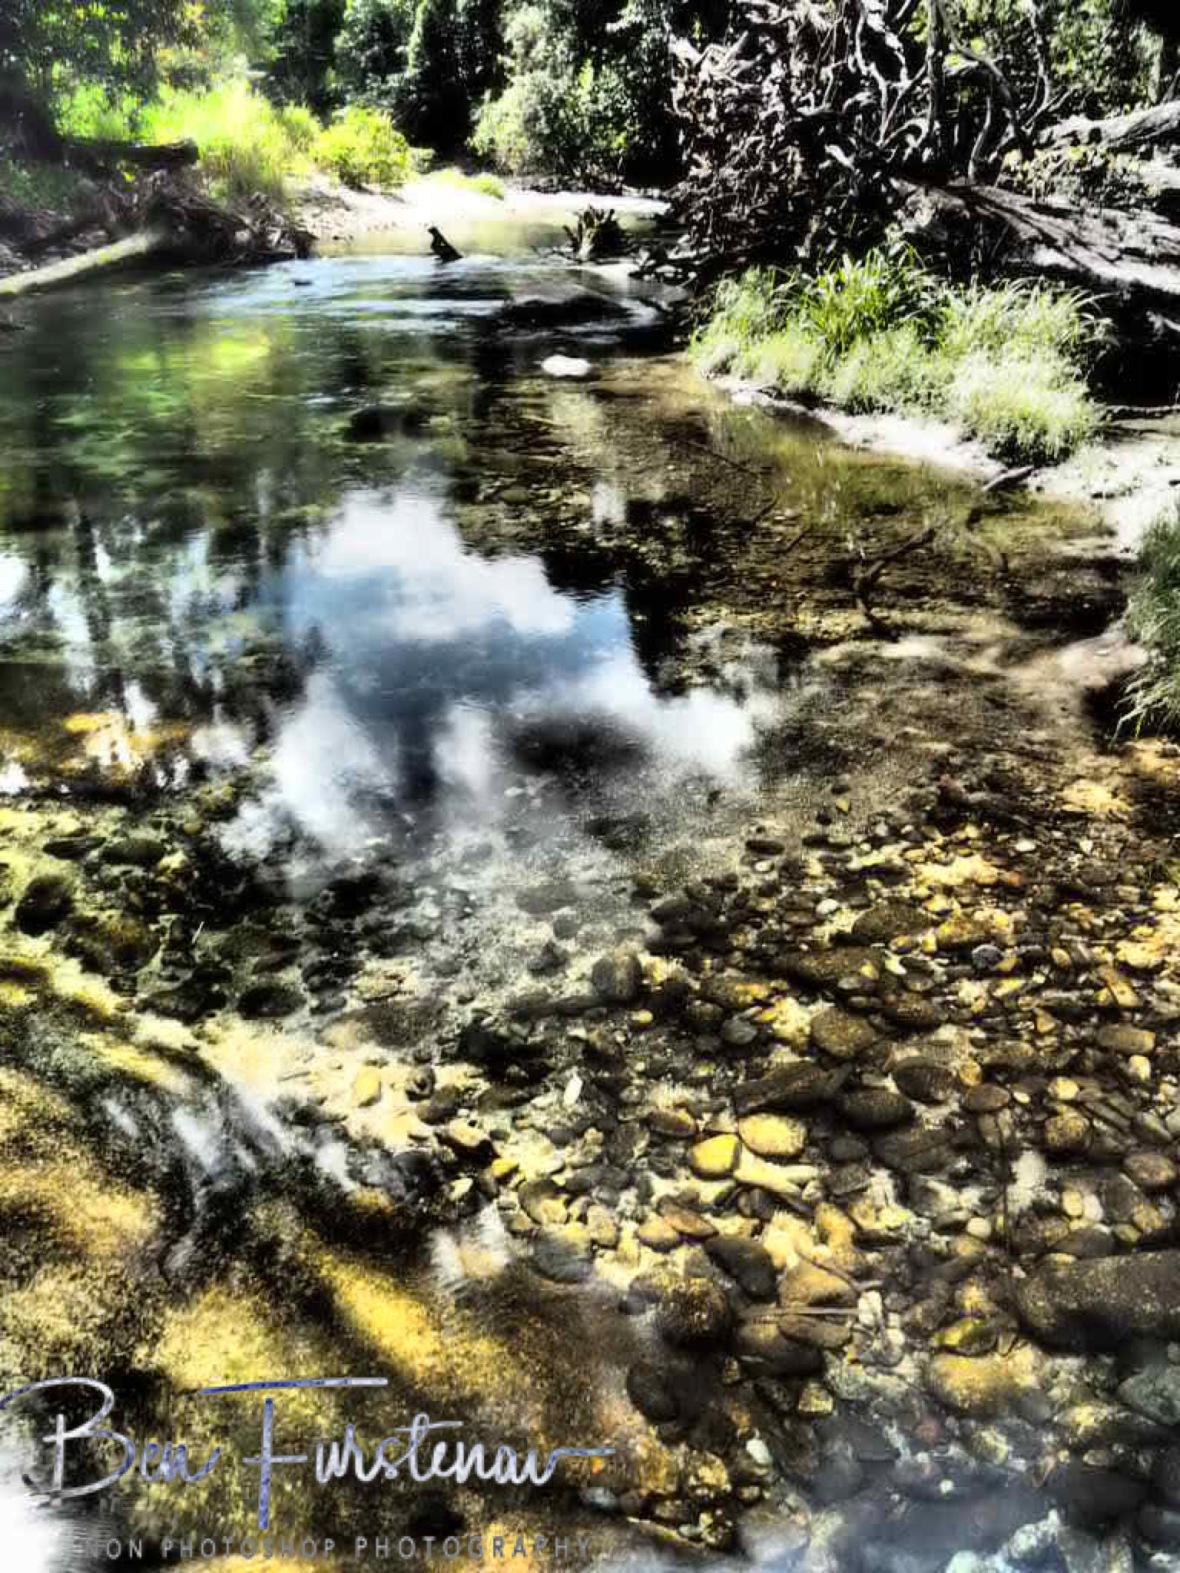 Pool reflections at Babinda, Tropical Northern Queensland, Australia